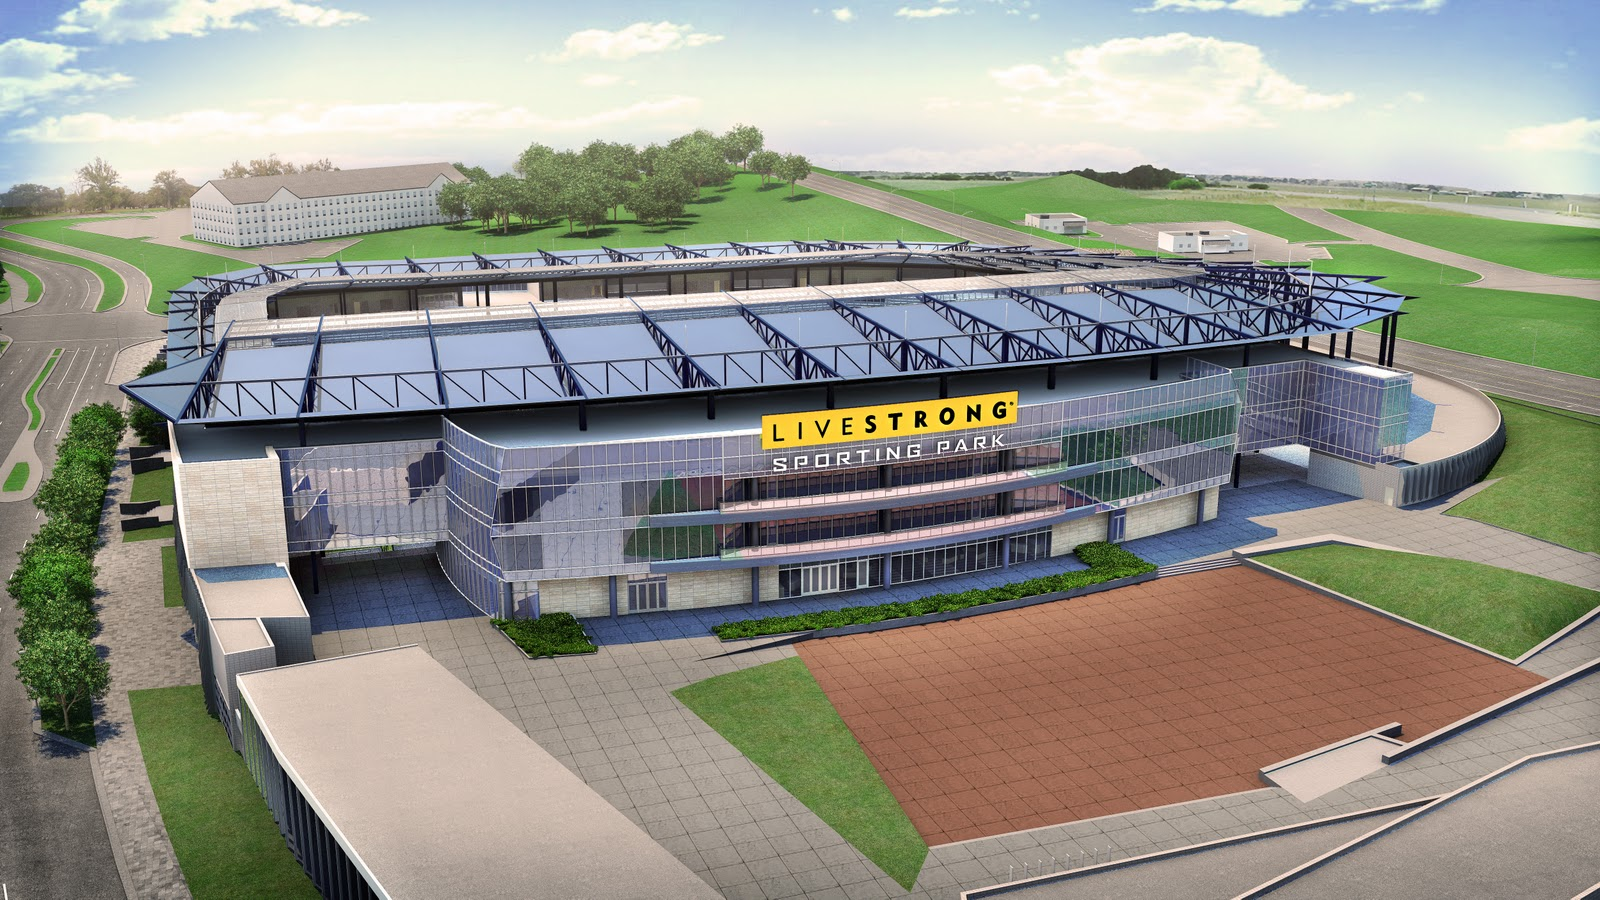 Ingyen kapott stadion névadói jogot a Livestrong alapítvány